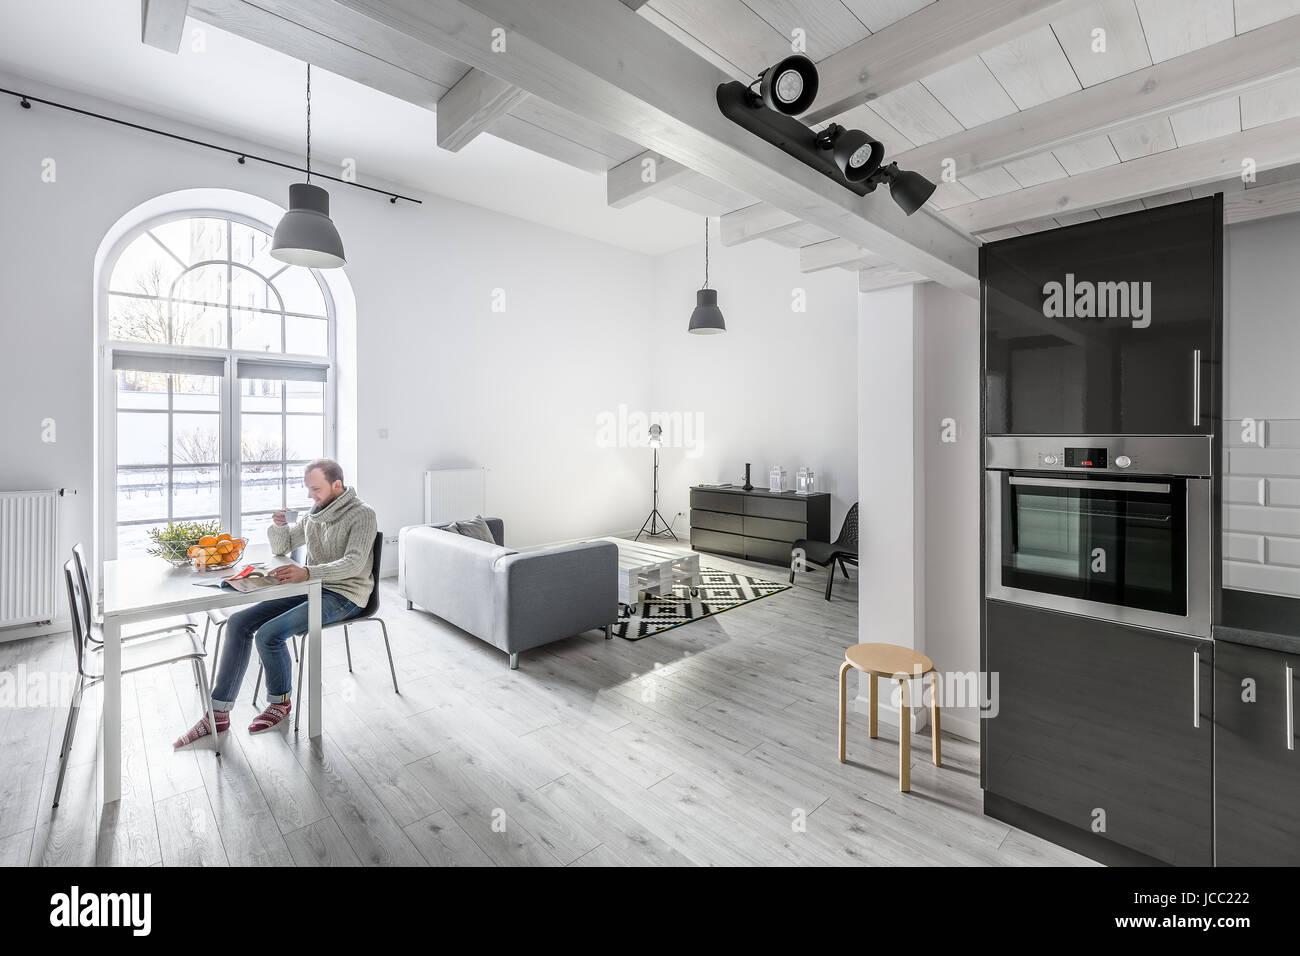 Open Plan Living Room Kitchen Stockfotos & Open Plan Living Room ...